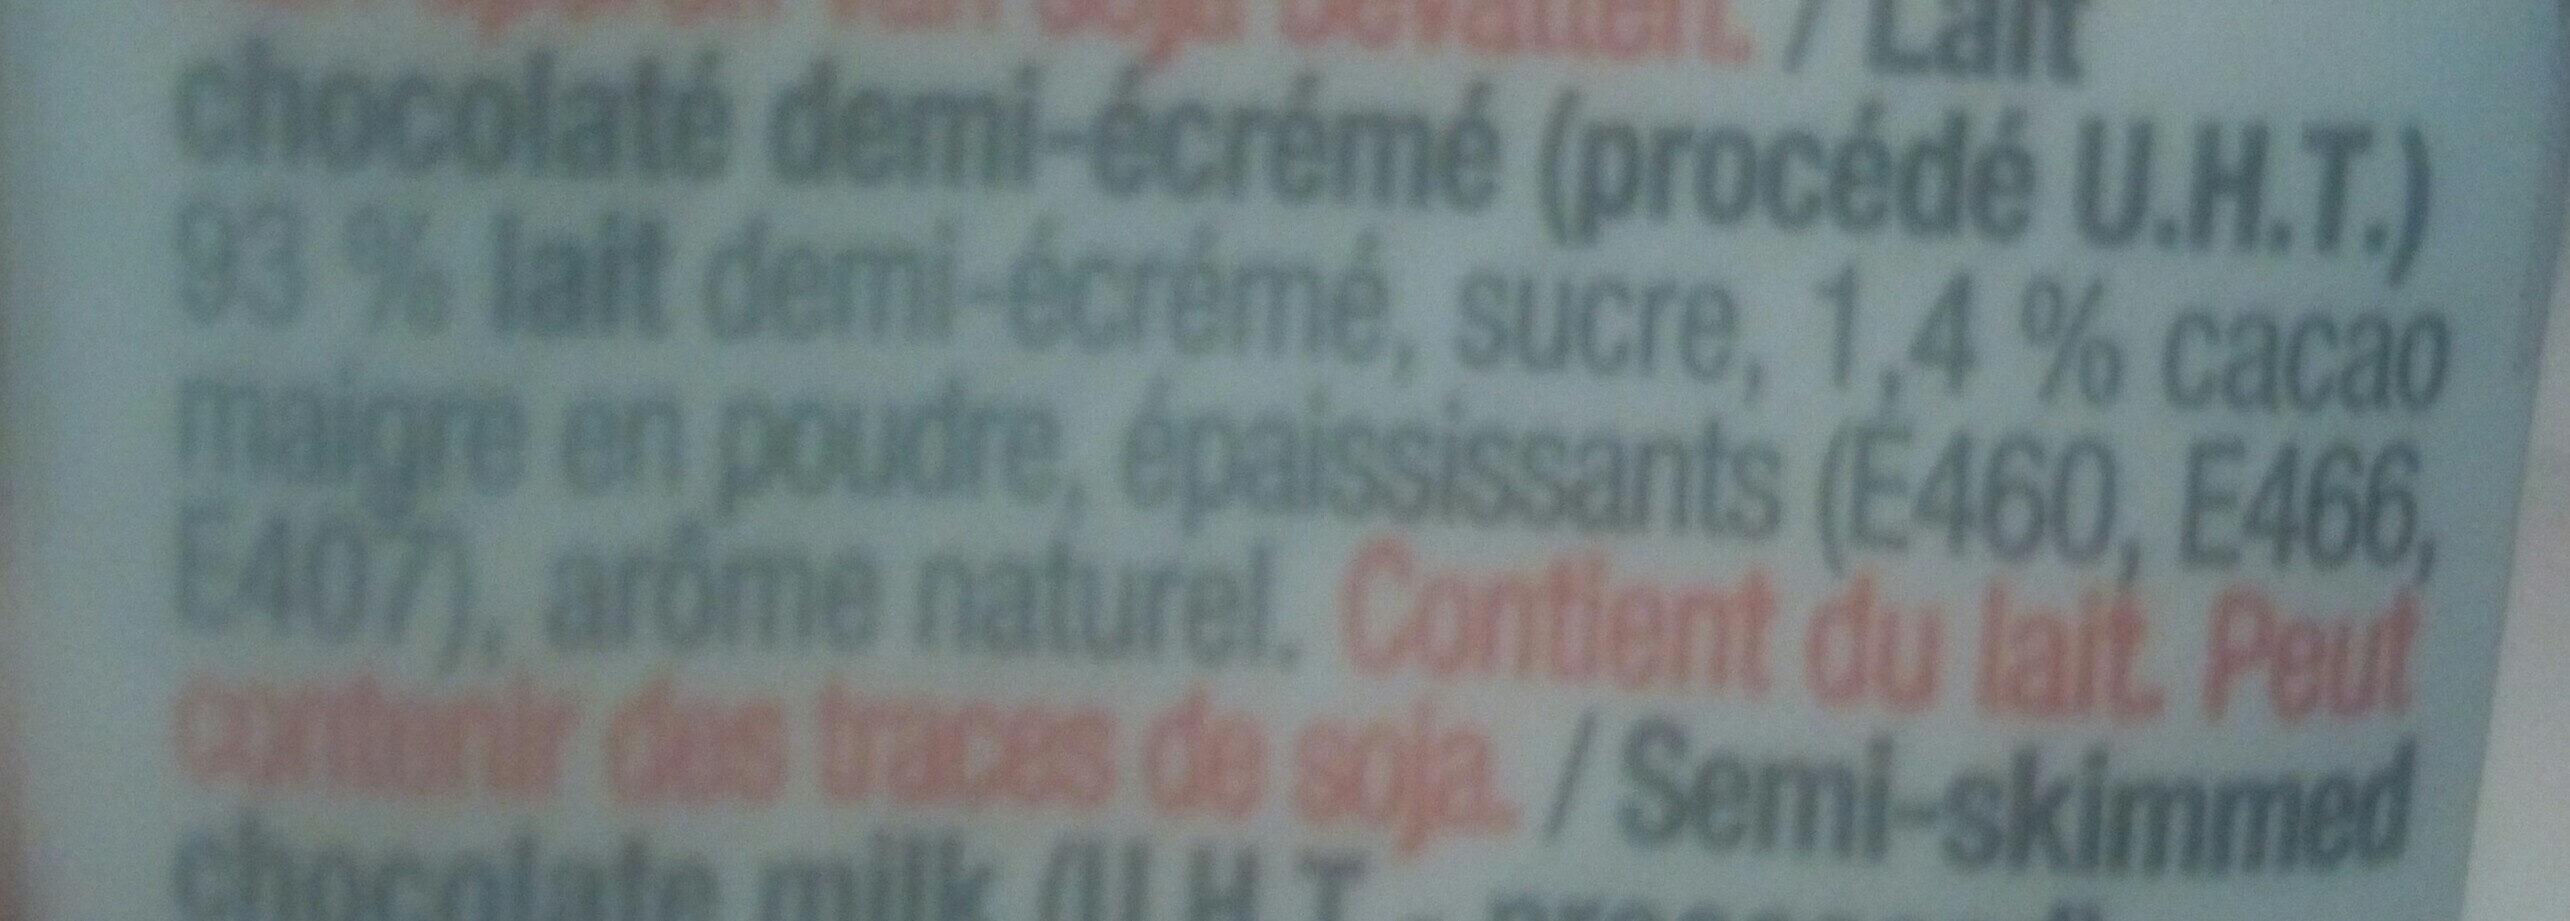 Chocomelk - Ingrediënten